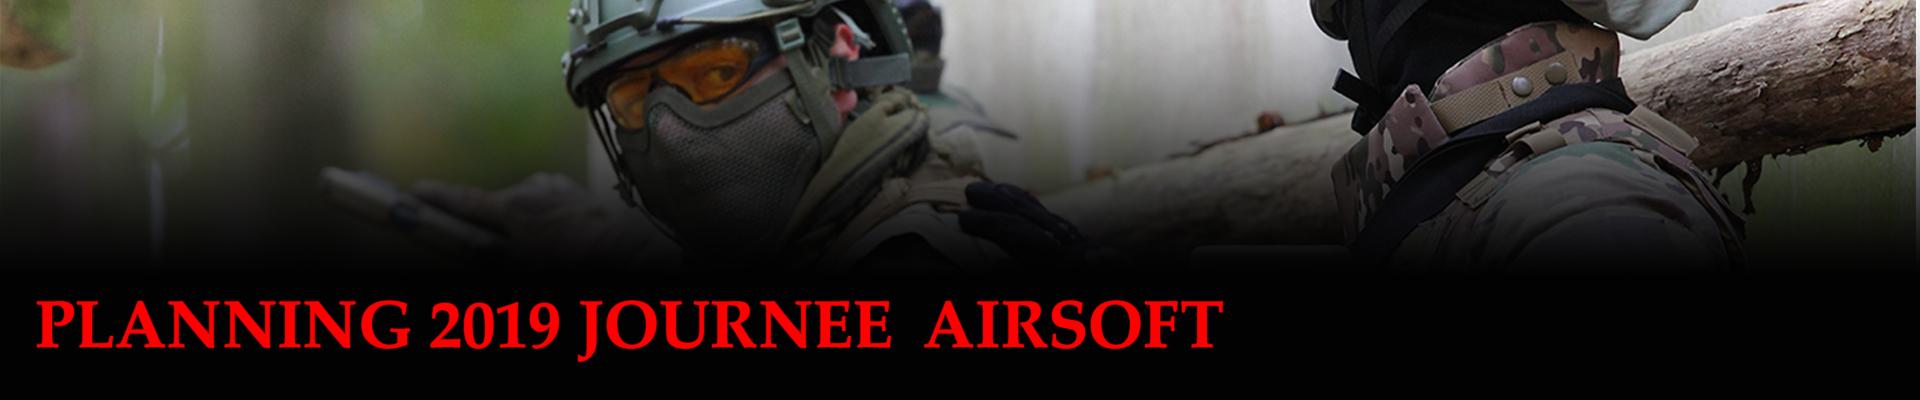 Planning Airsoft